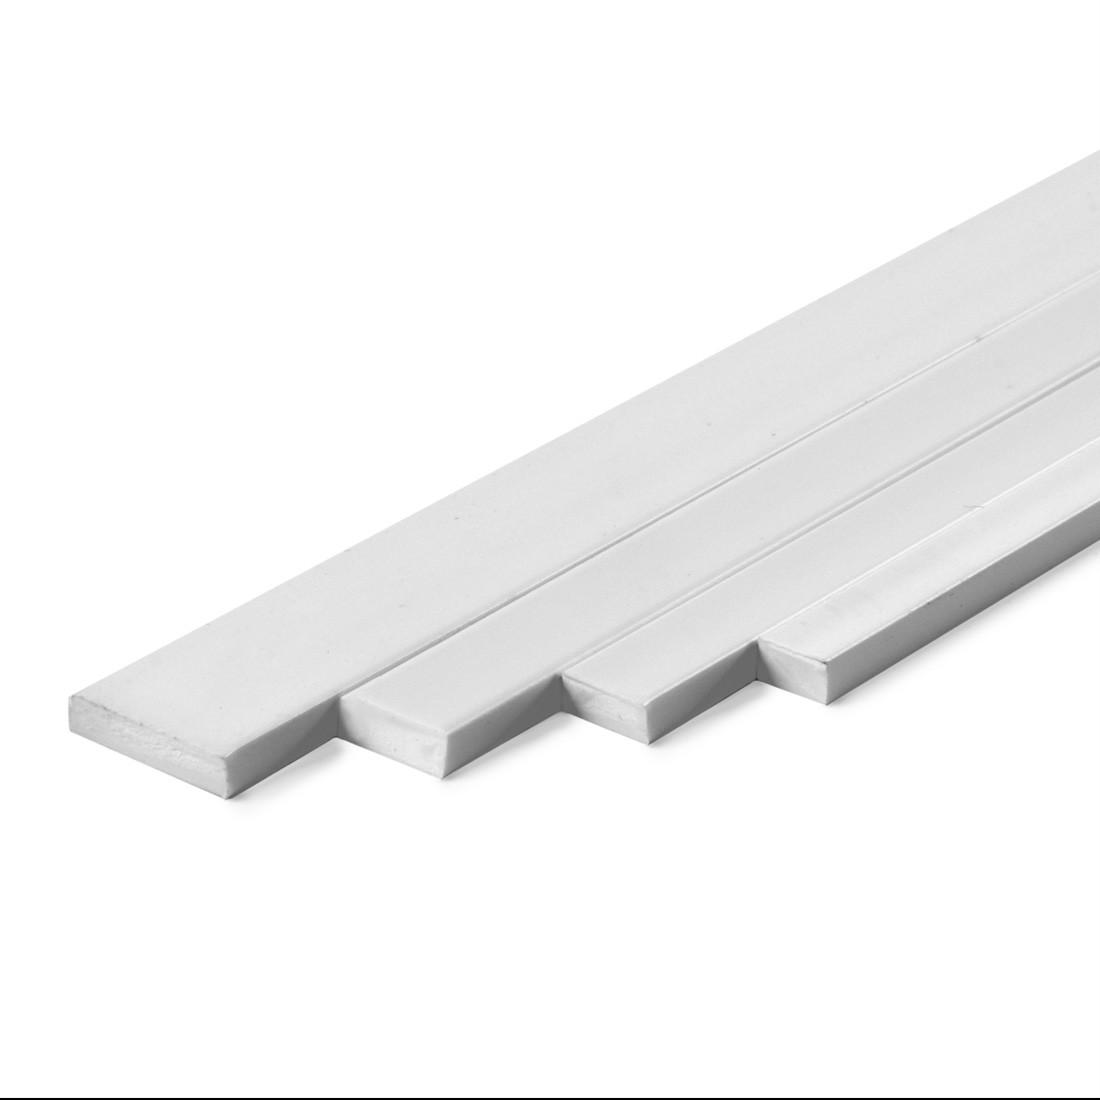 ASA rectangular profile mm.2x5x1000